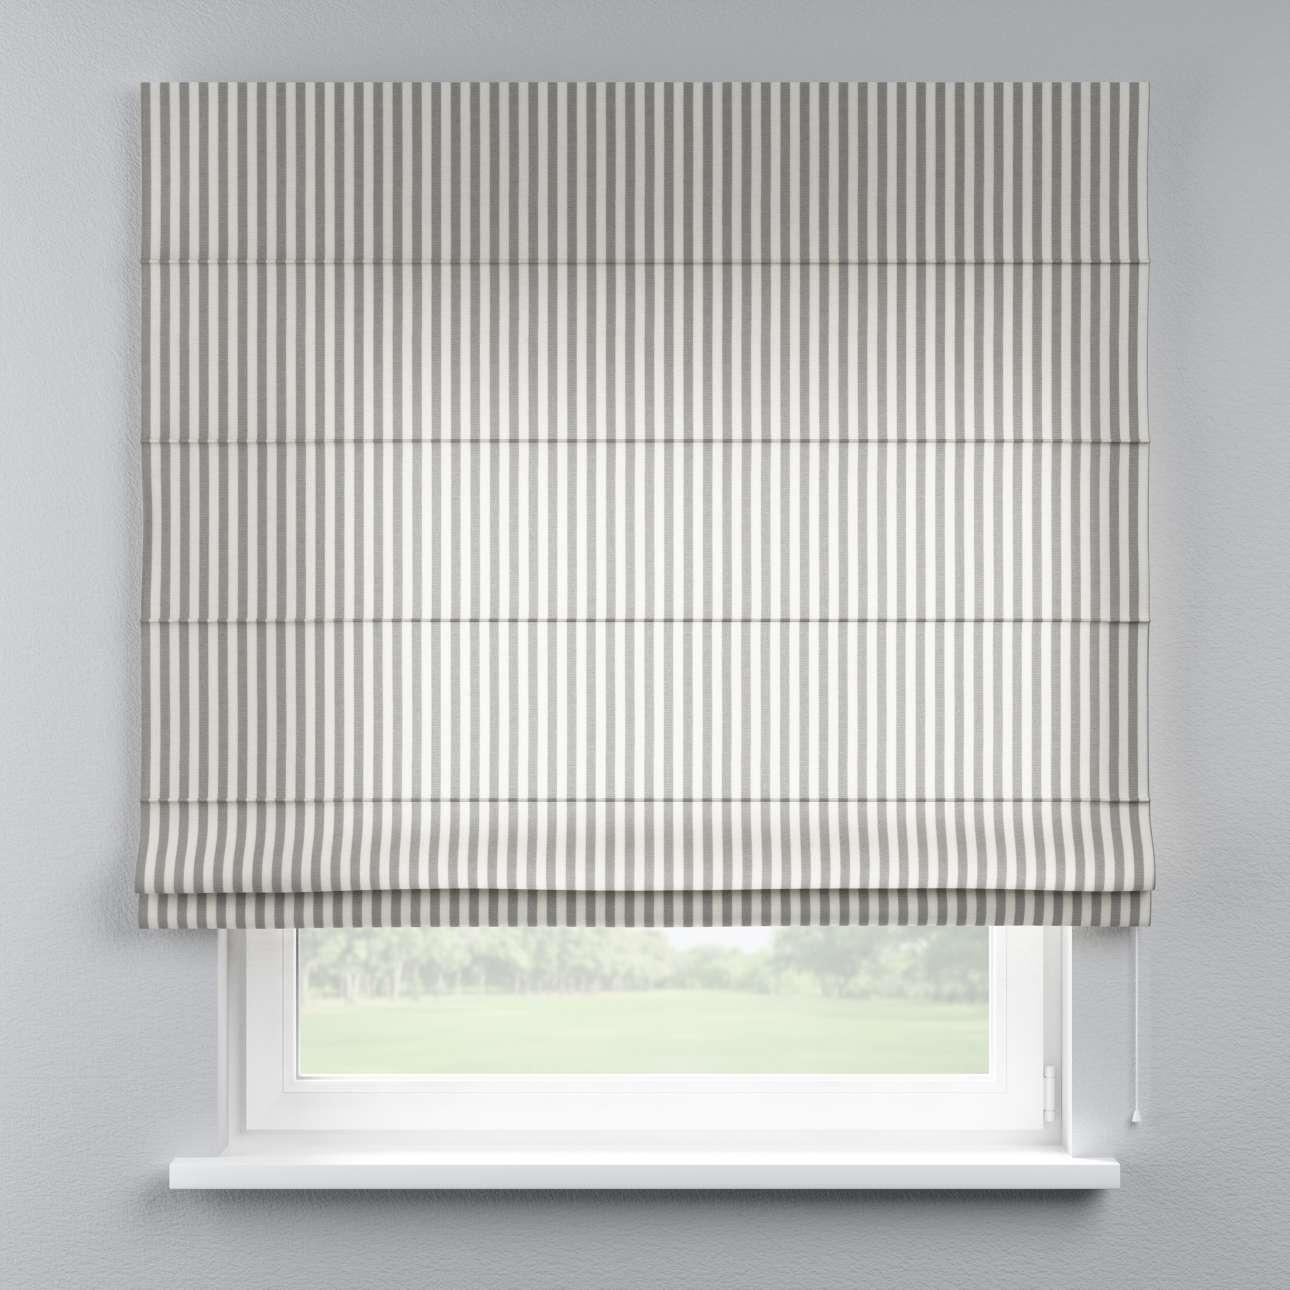 Capri roman blind 80 x 170 cm (31.5 x 67 inch) in collection Quadro, fabric: 136-12